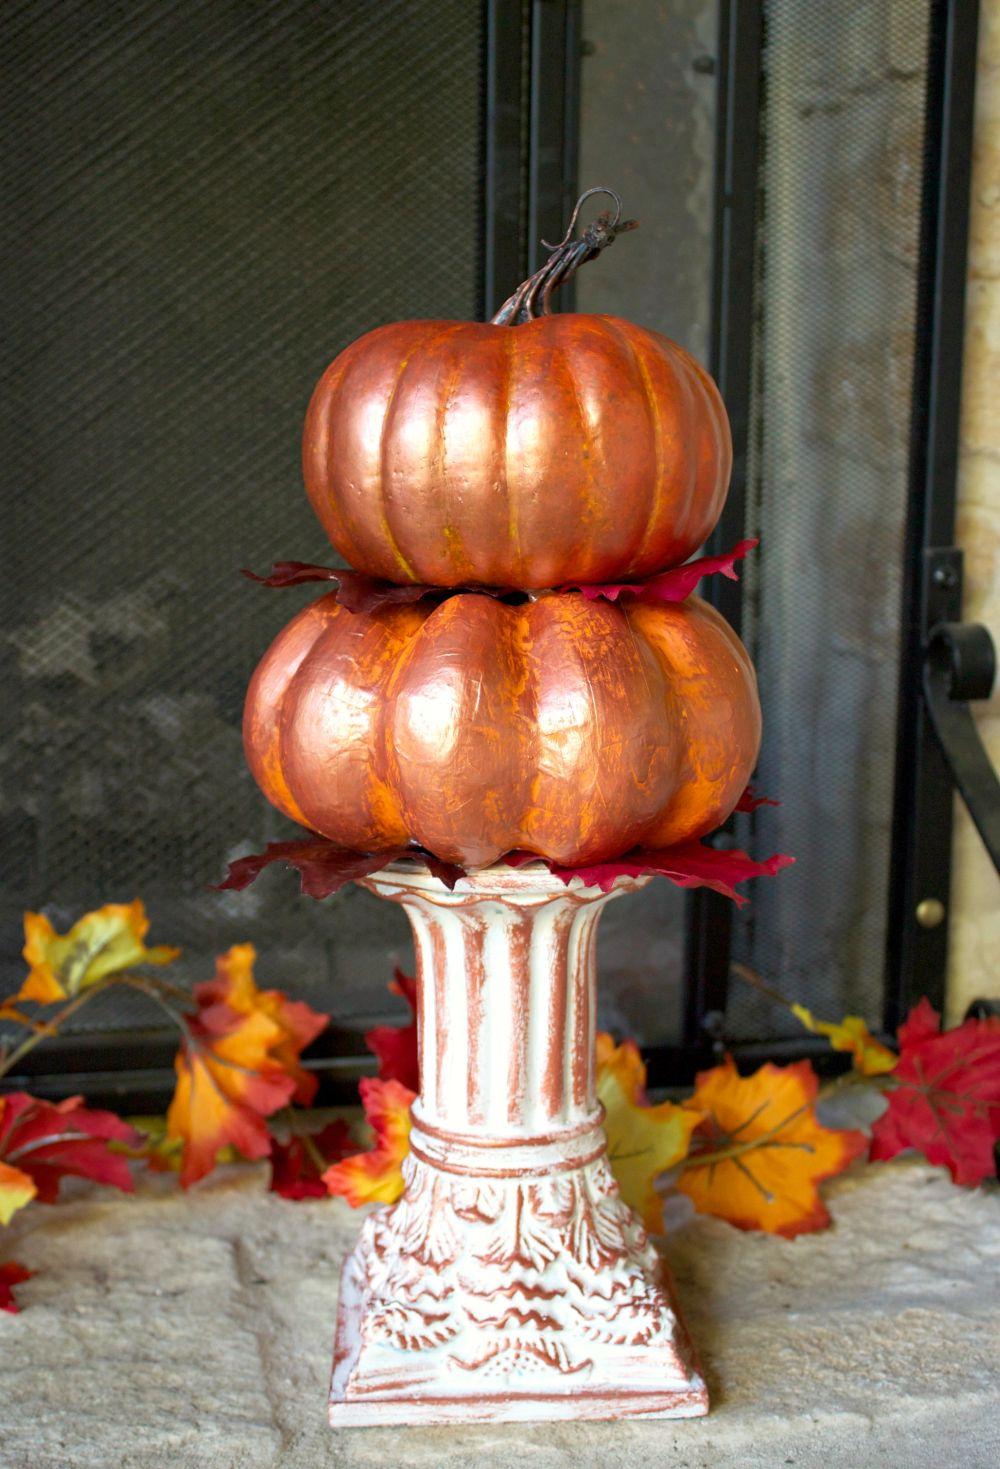 DIY Stacked Metallic Pumpkins Centerpiece for Fall